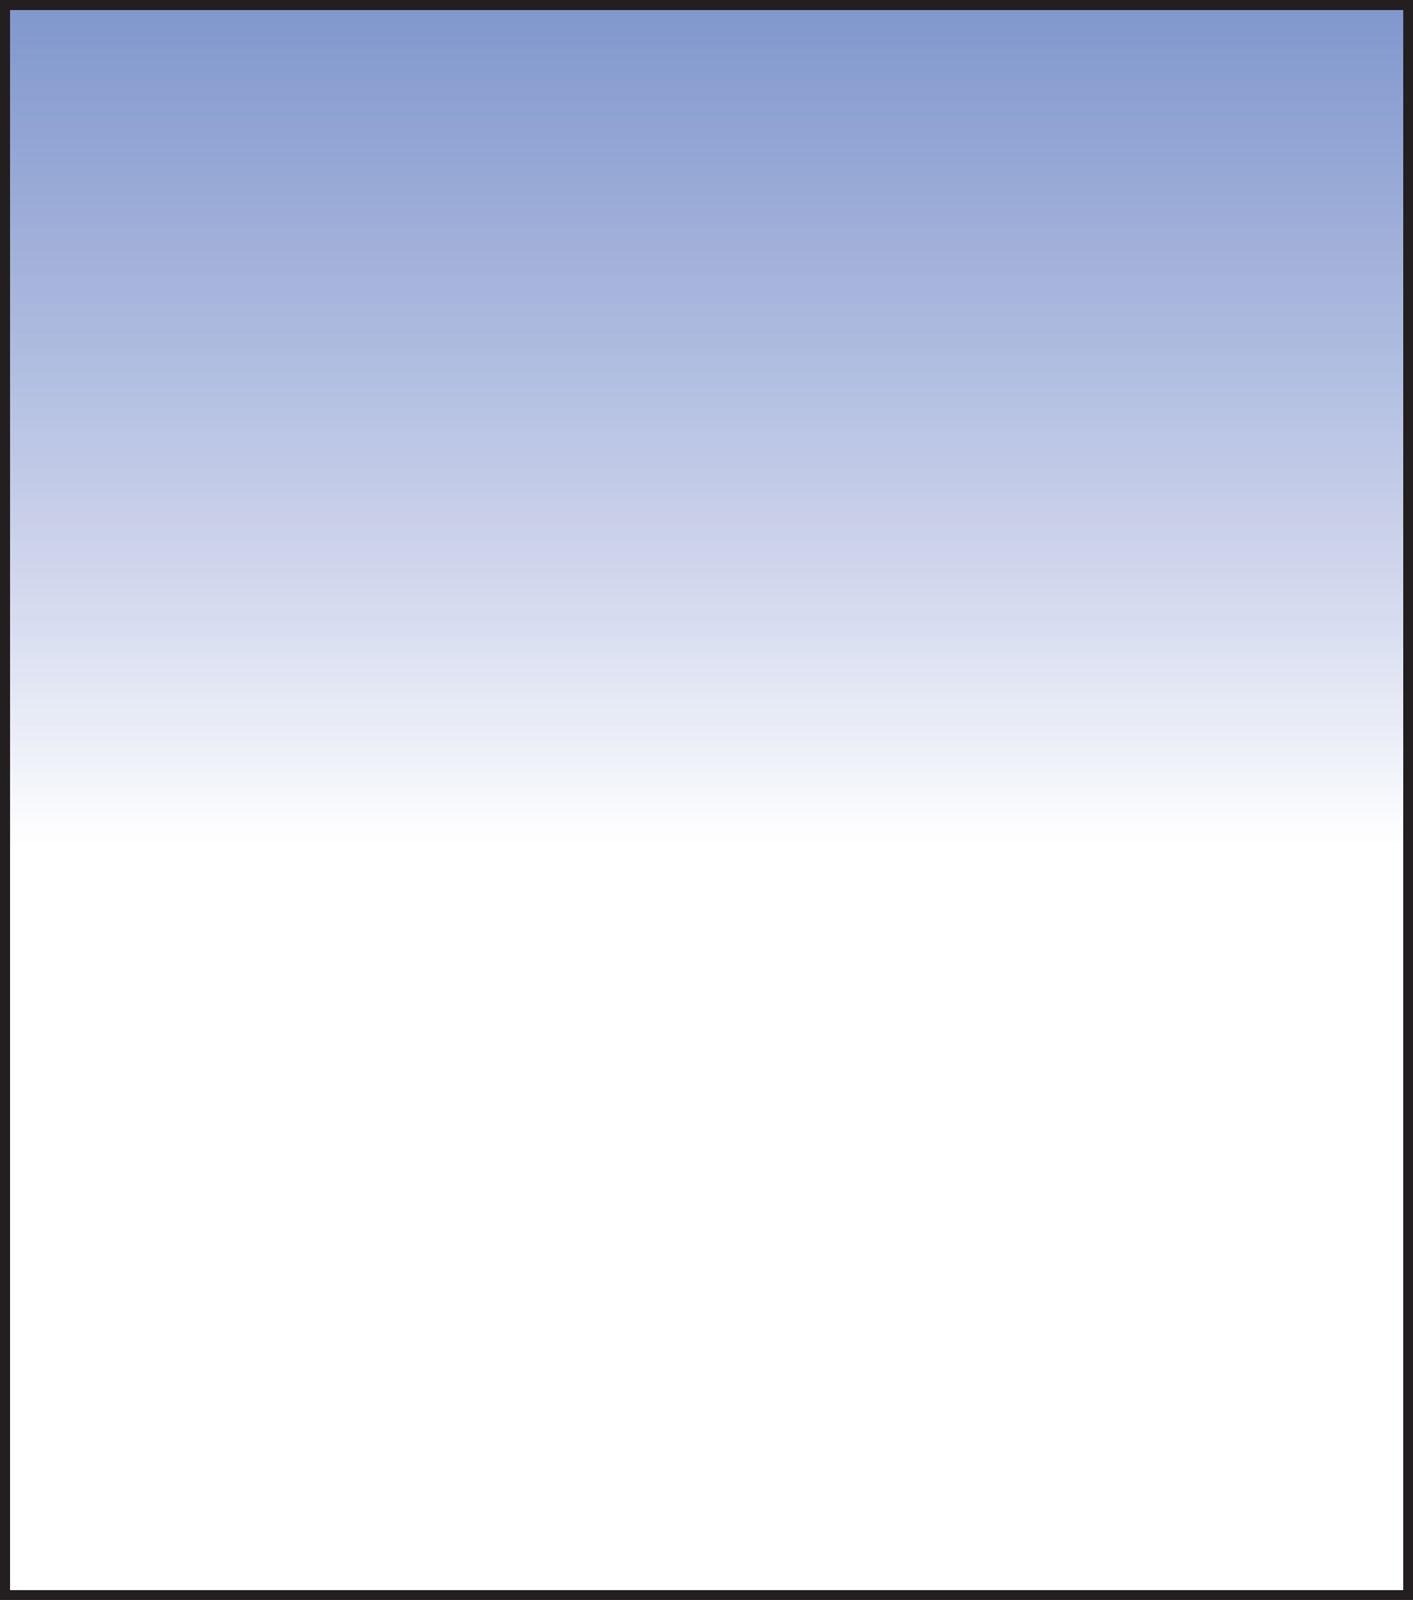 SW150-Real-Blue-2-Soft-Grad